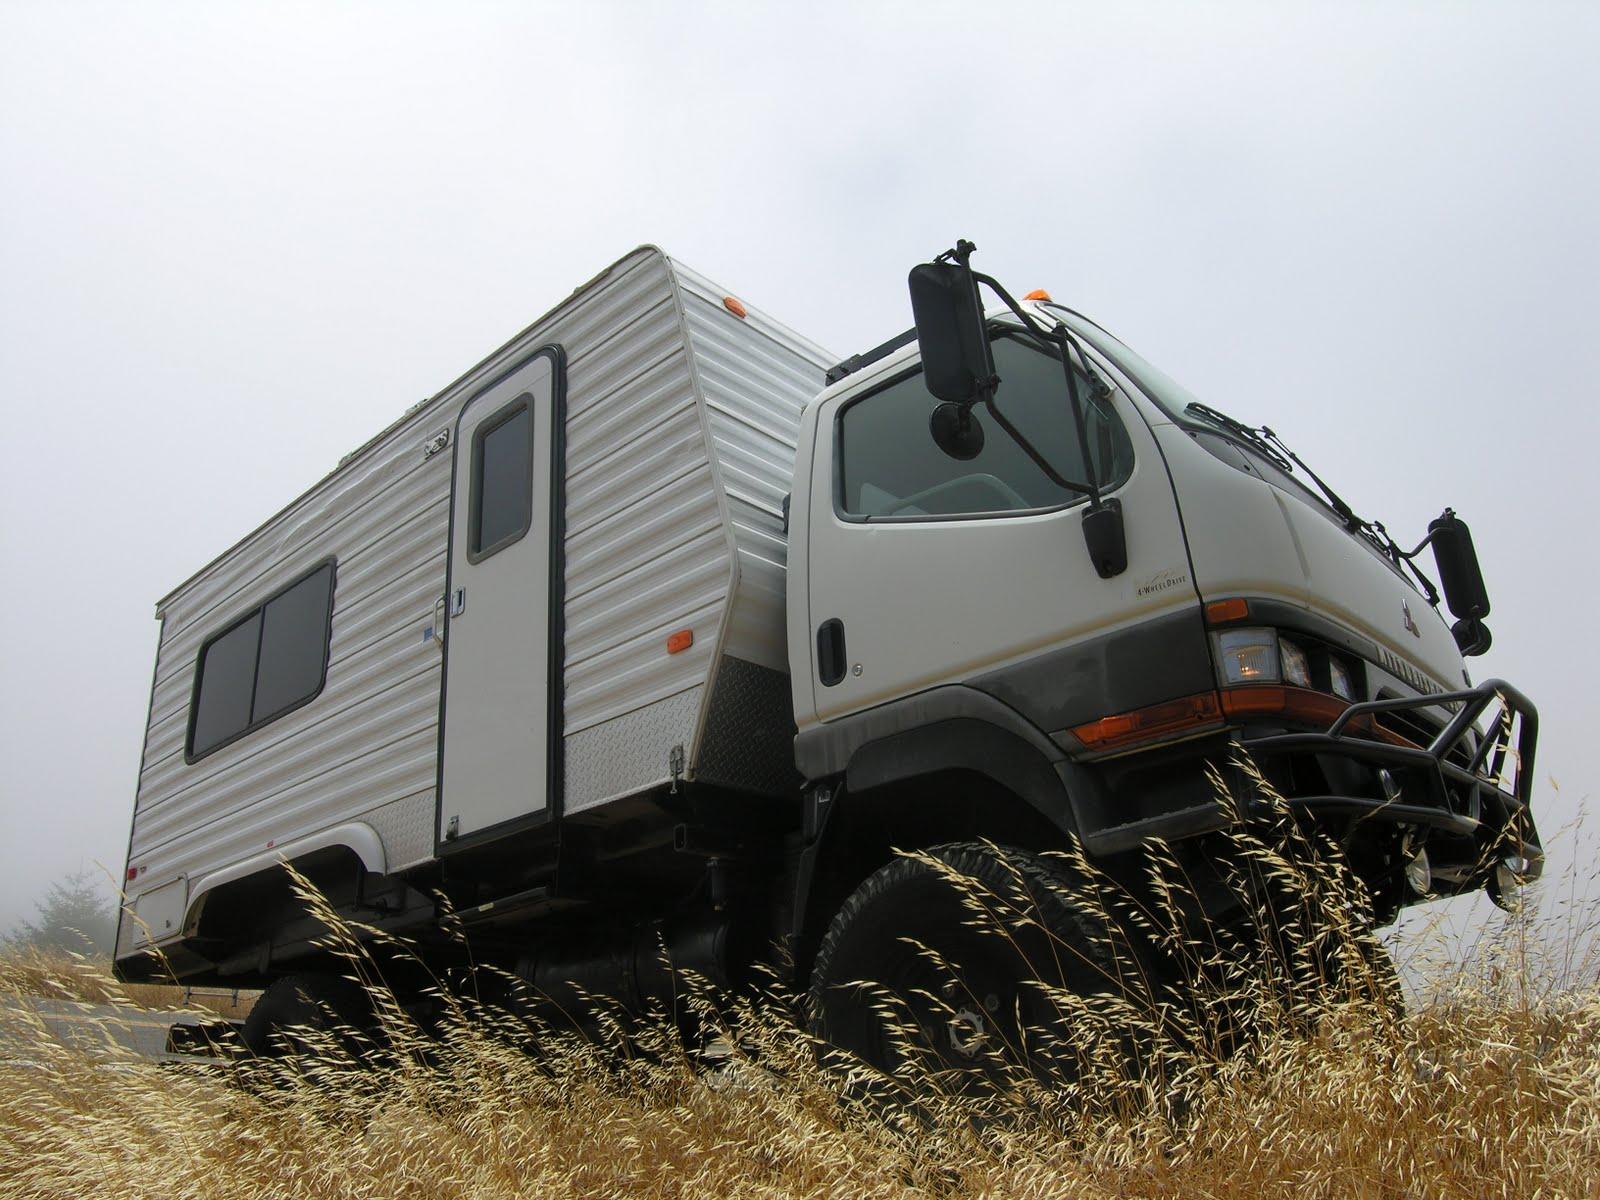 4x4 Rv Adventure Vehicle